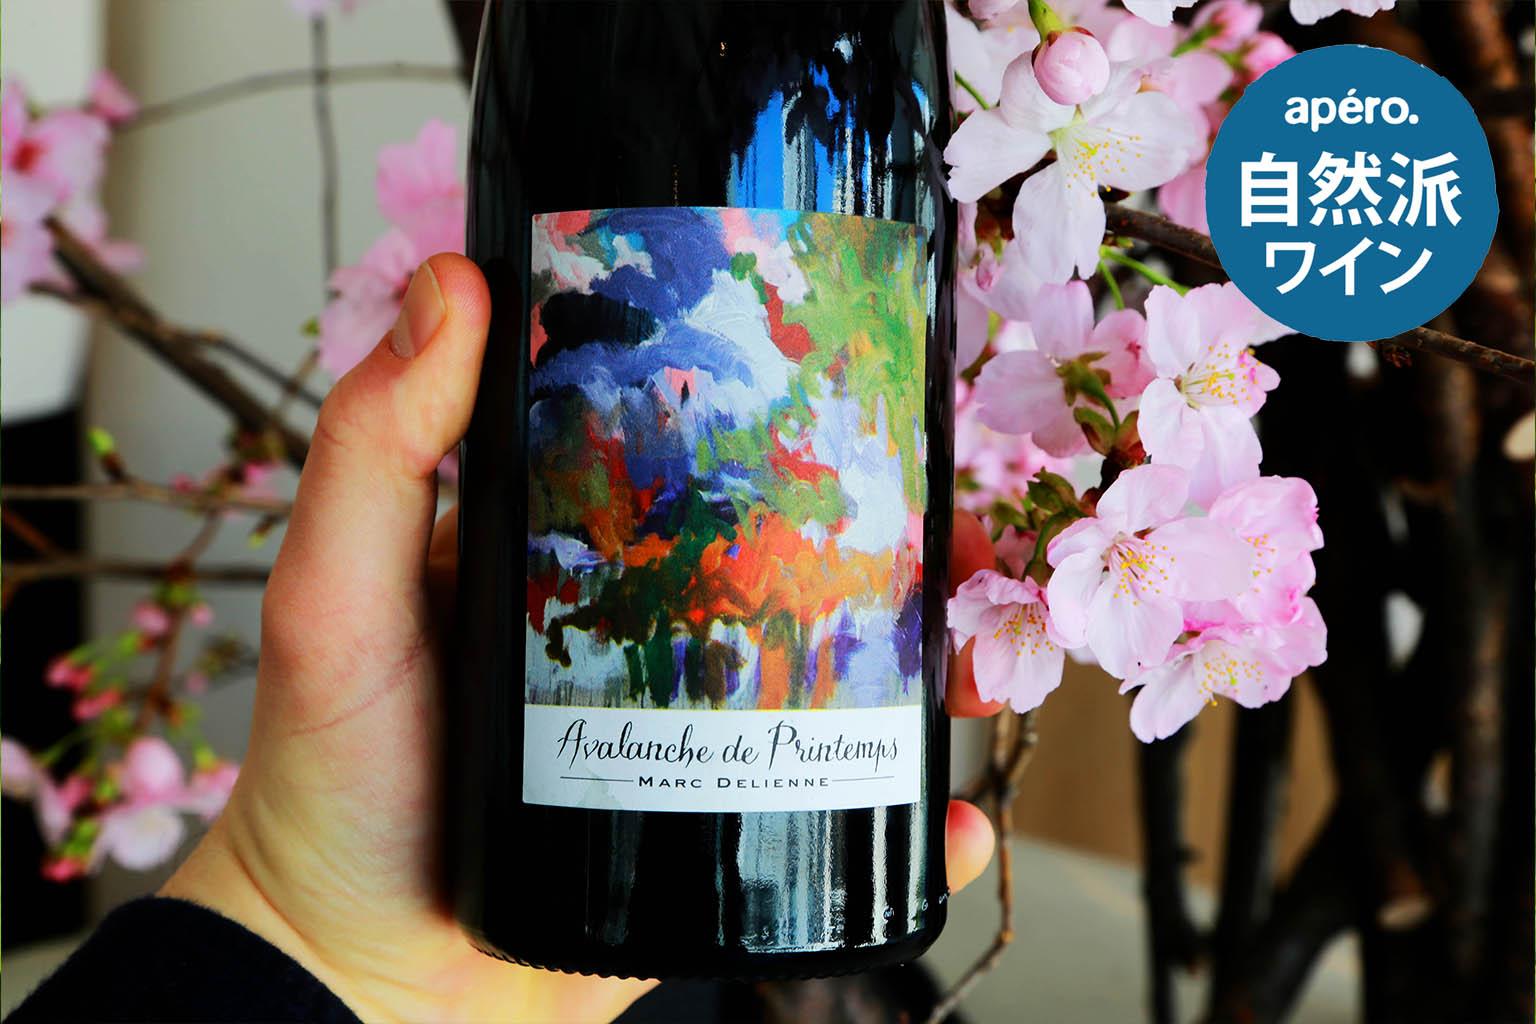 Apero's Natural Wines - アペロ ワインバー / apéro WINEBAR - vins et petits plats français - Minami Aoyama Tokyo